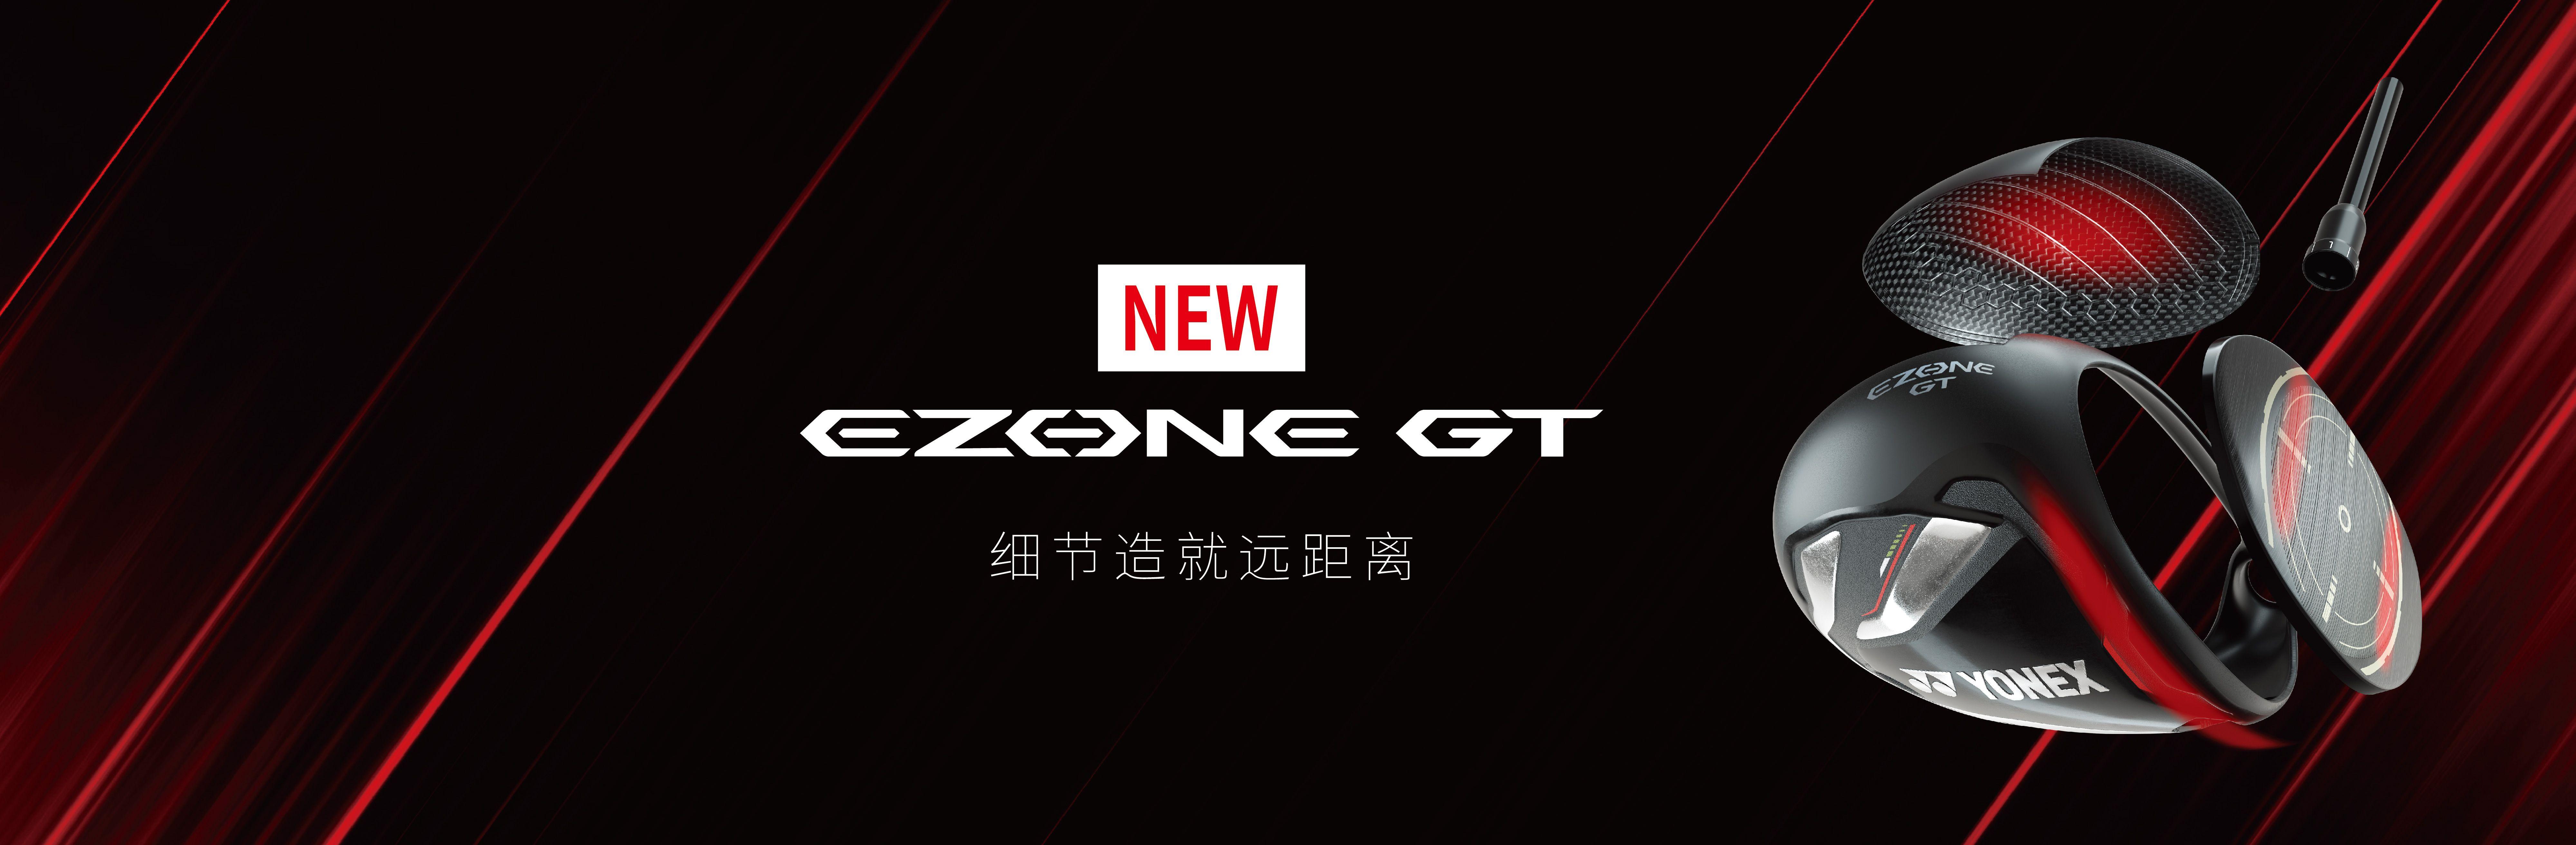 首頁幻燈6-EZONE GT